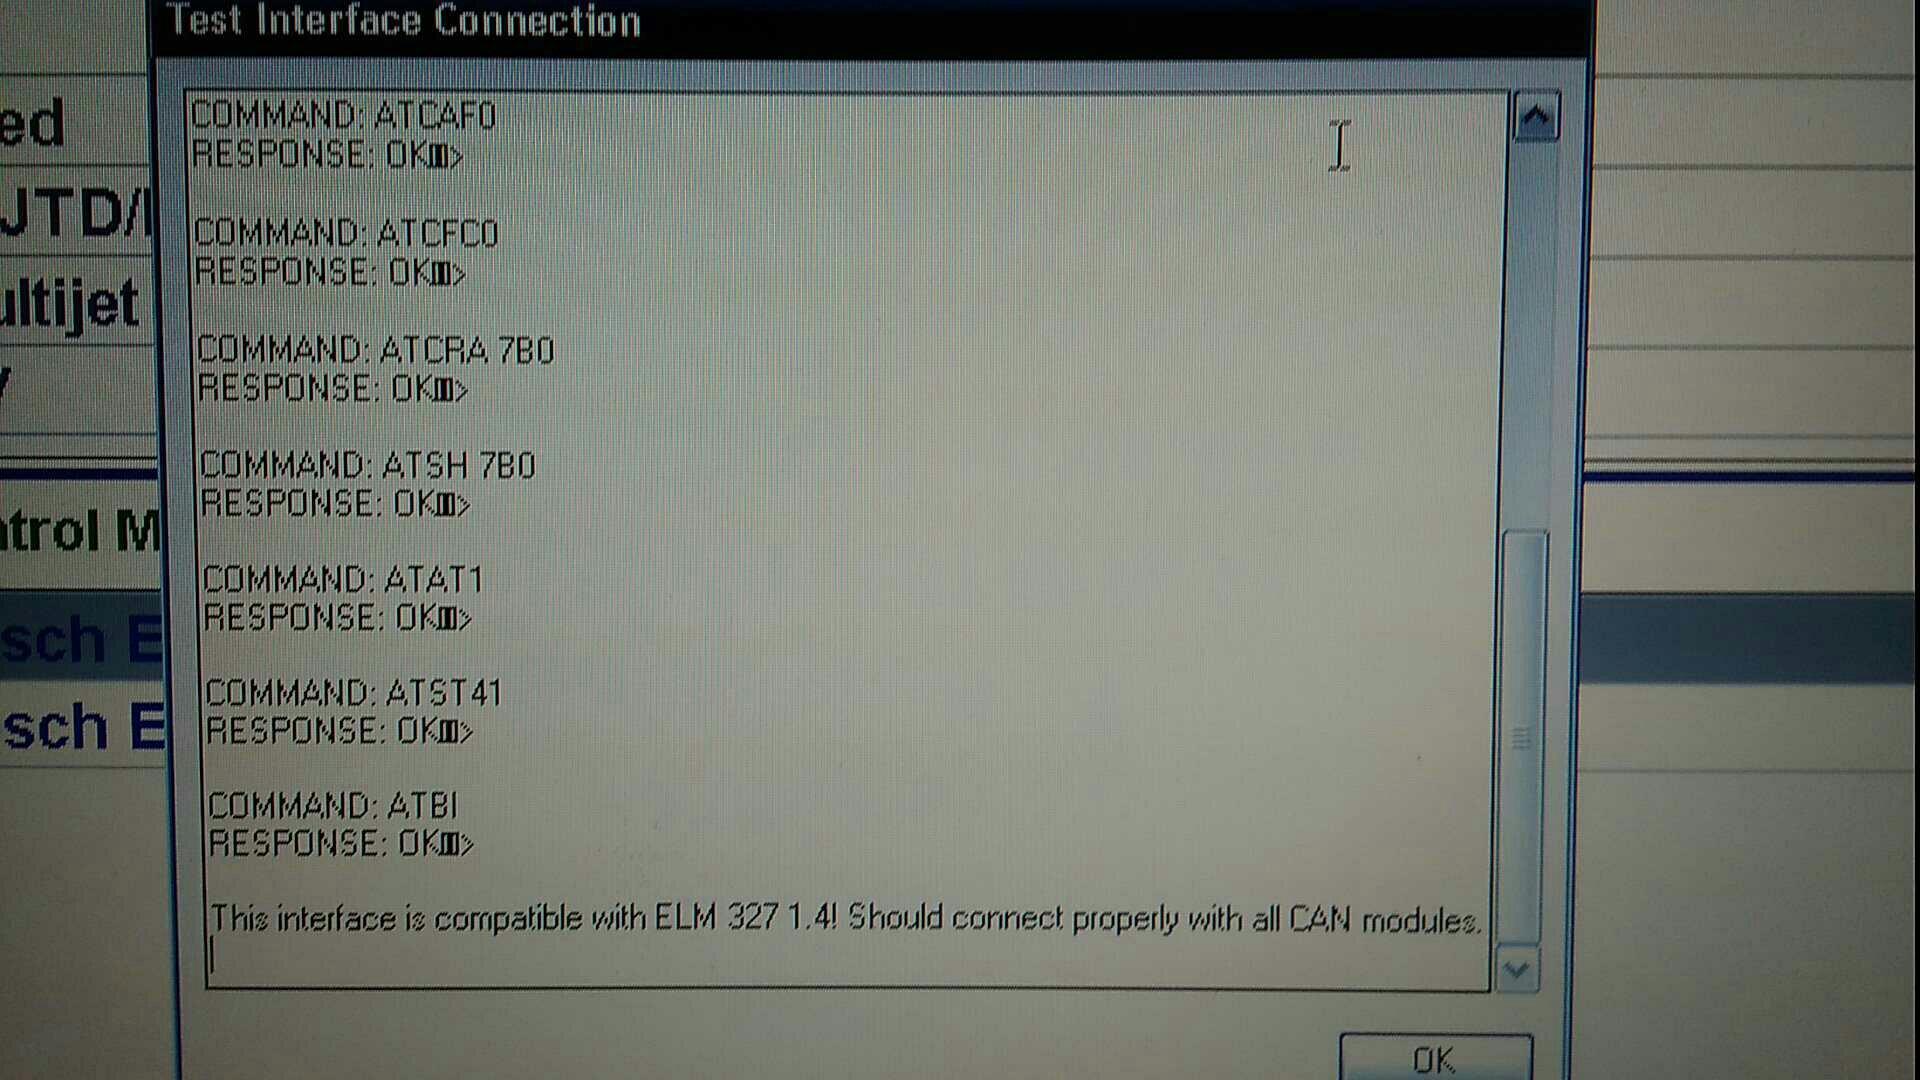 4e1d91308cc1e757e1ea4bace64a42c7.jpg